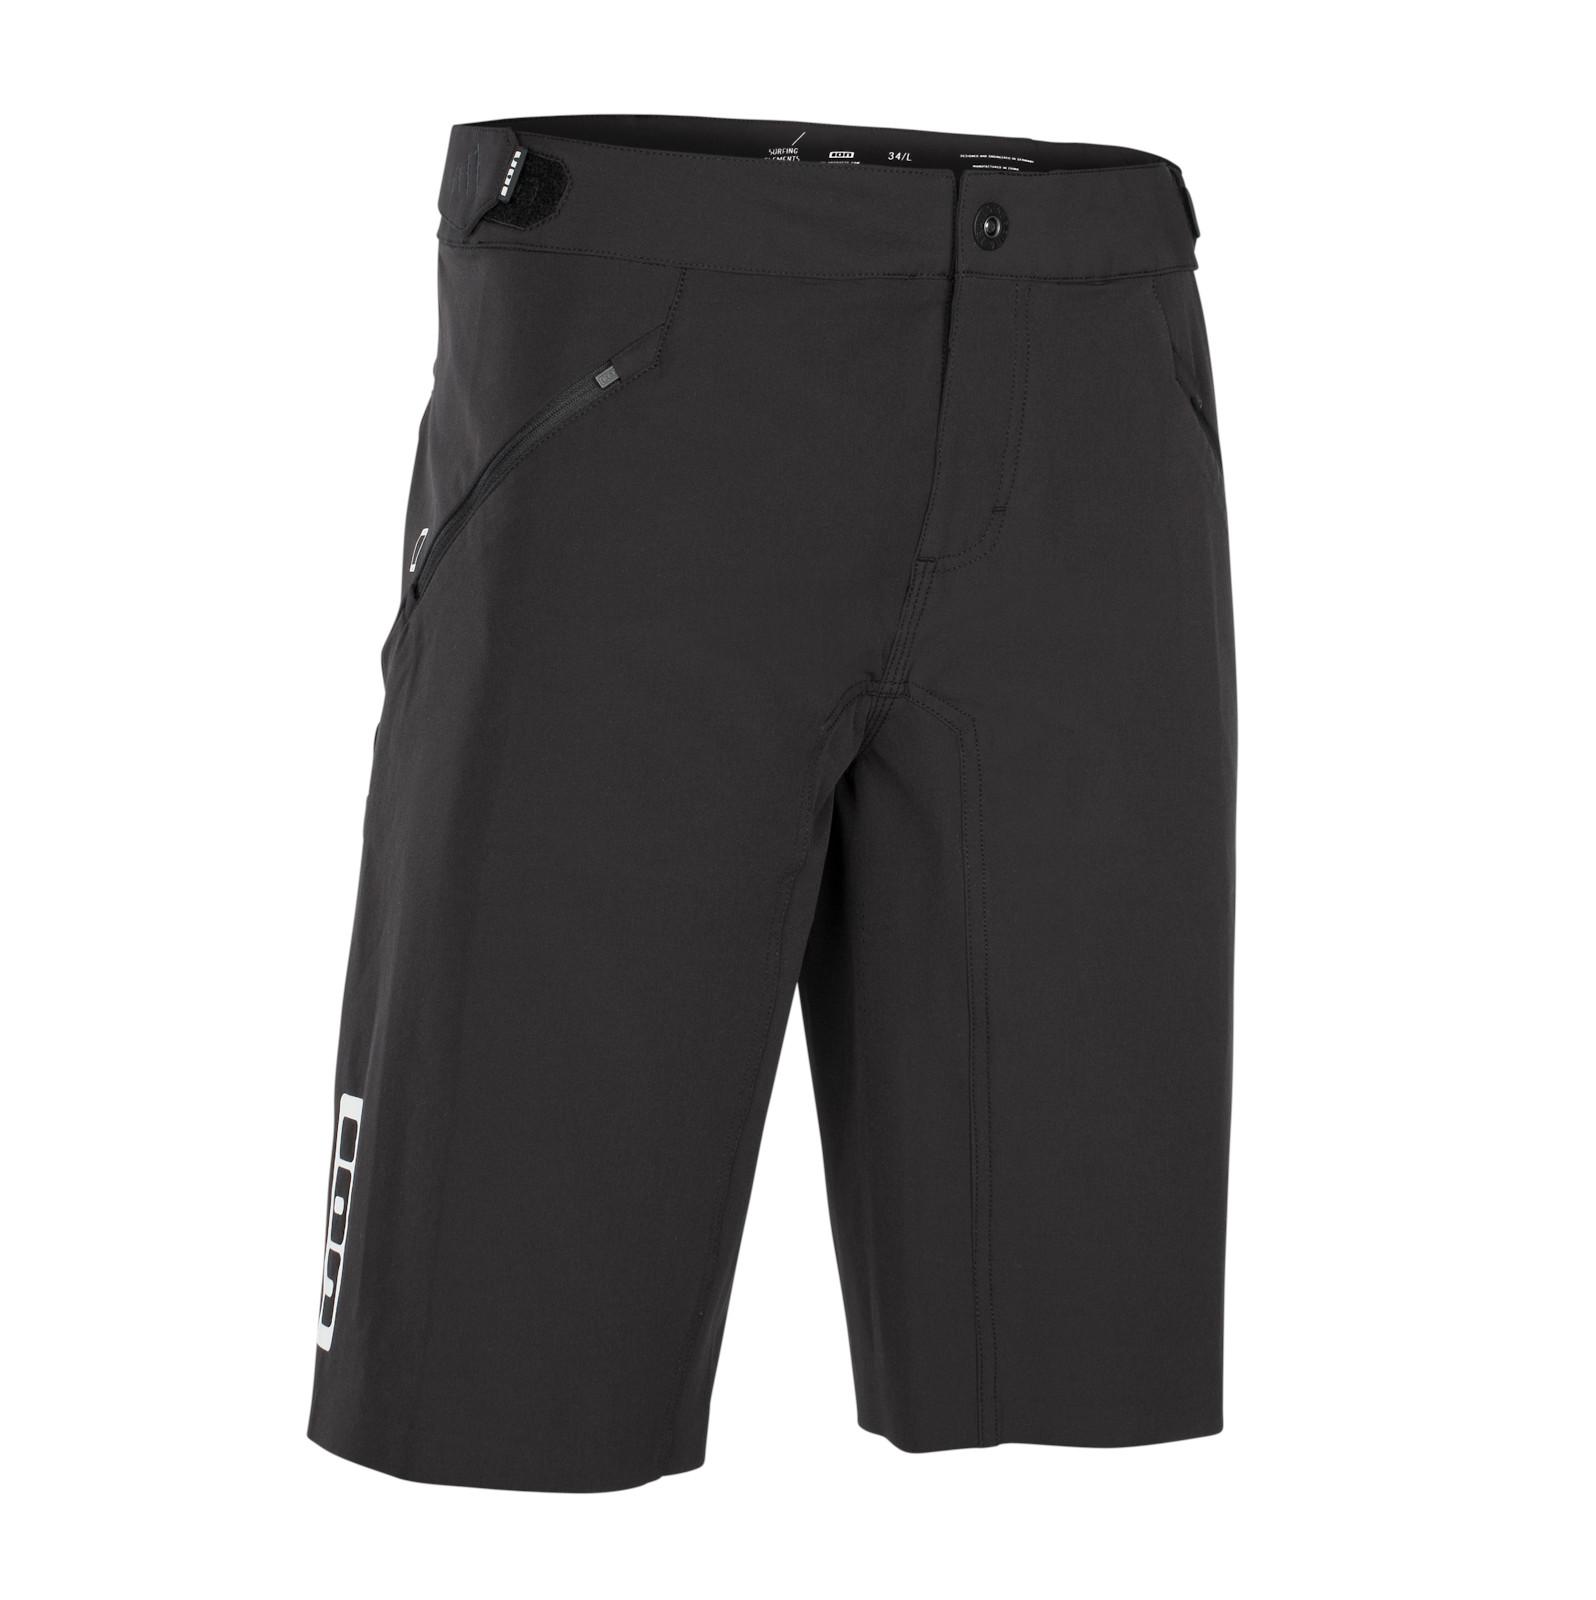 ION Traze Amp Bike Short (black)